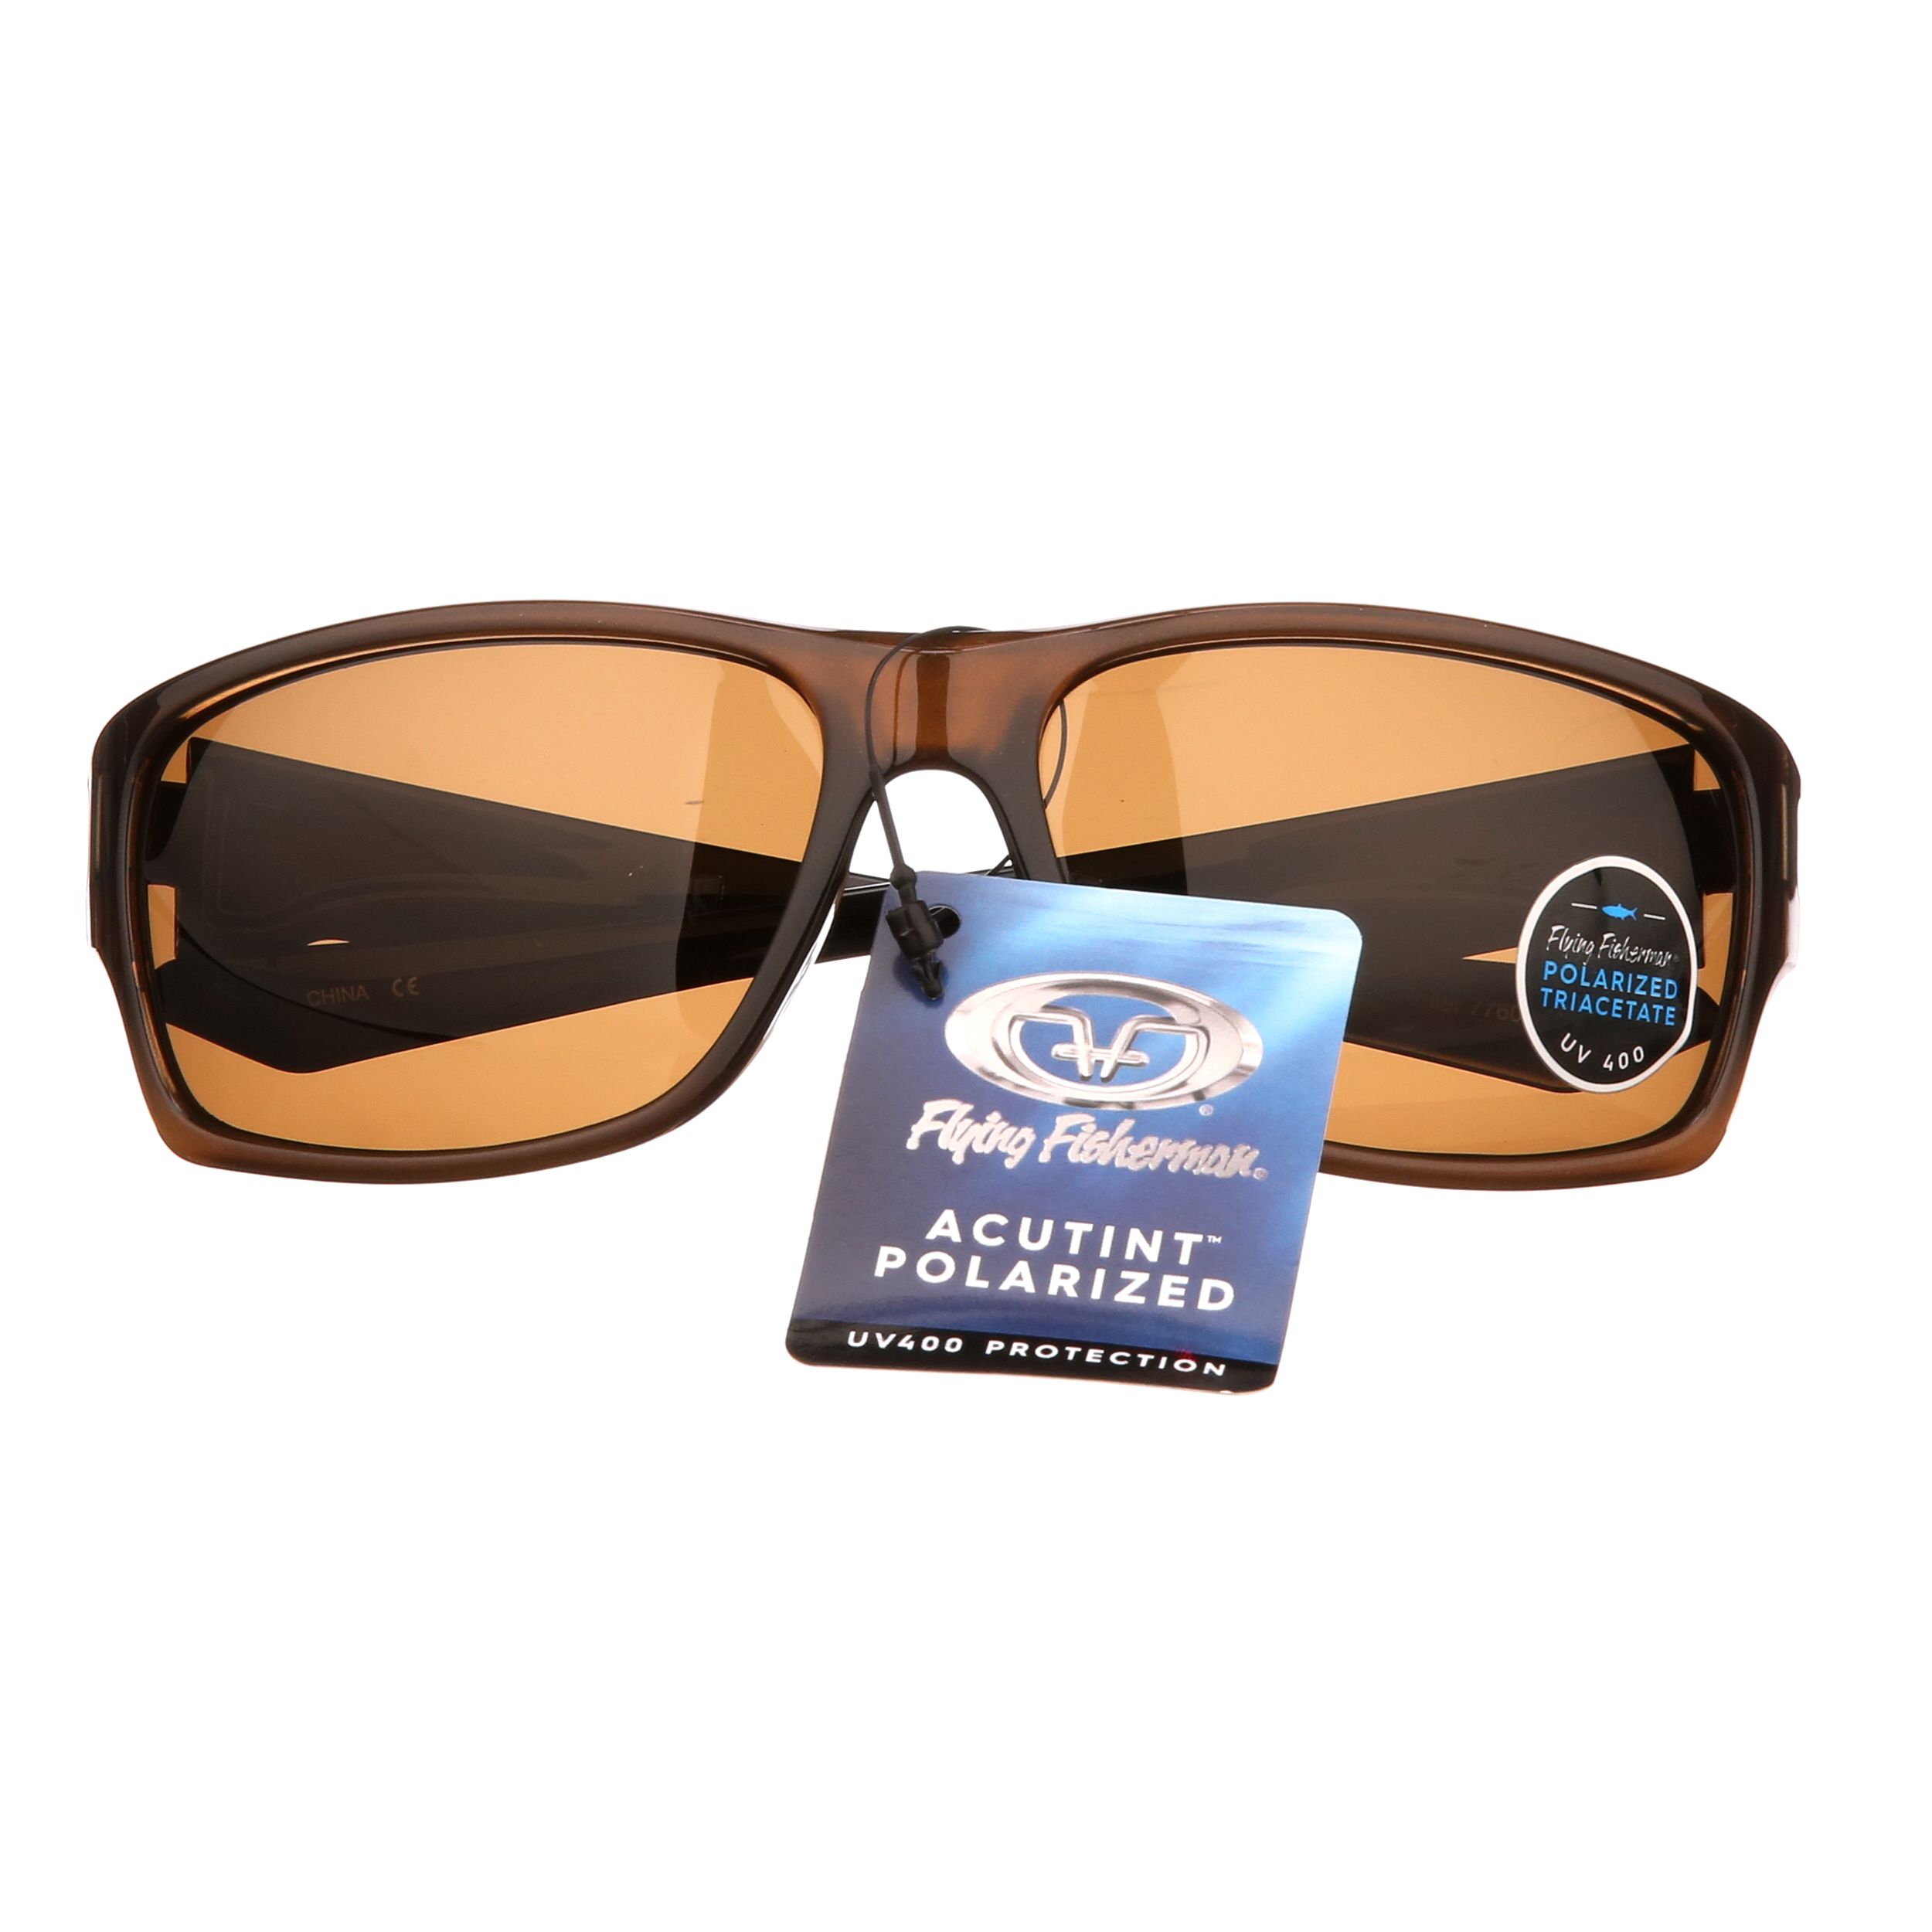 1d04d0ba1dca9 Flying Fisherman Roller Polarized Sunglasses - Walmart.com